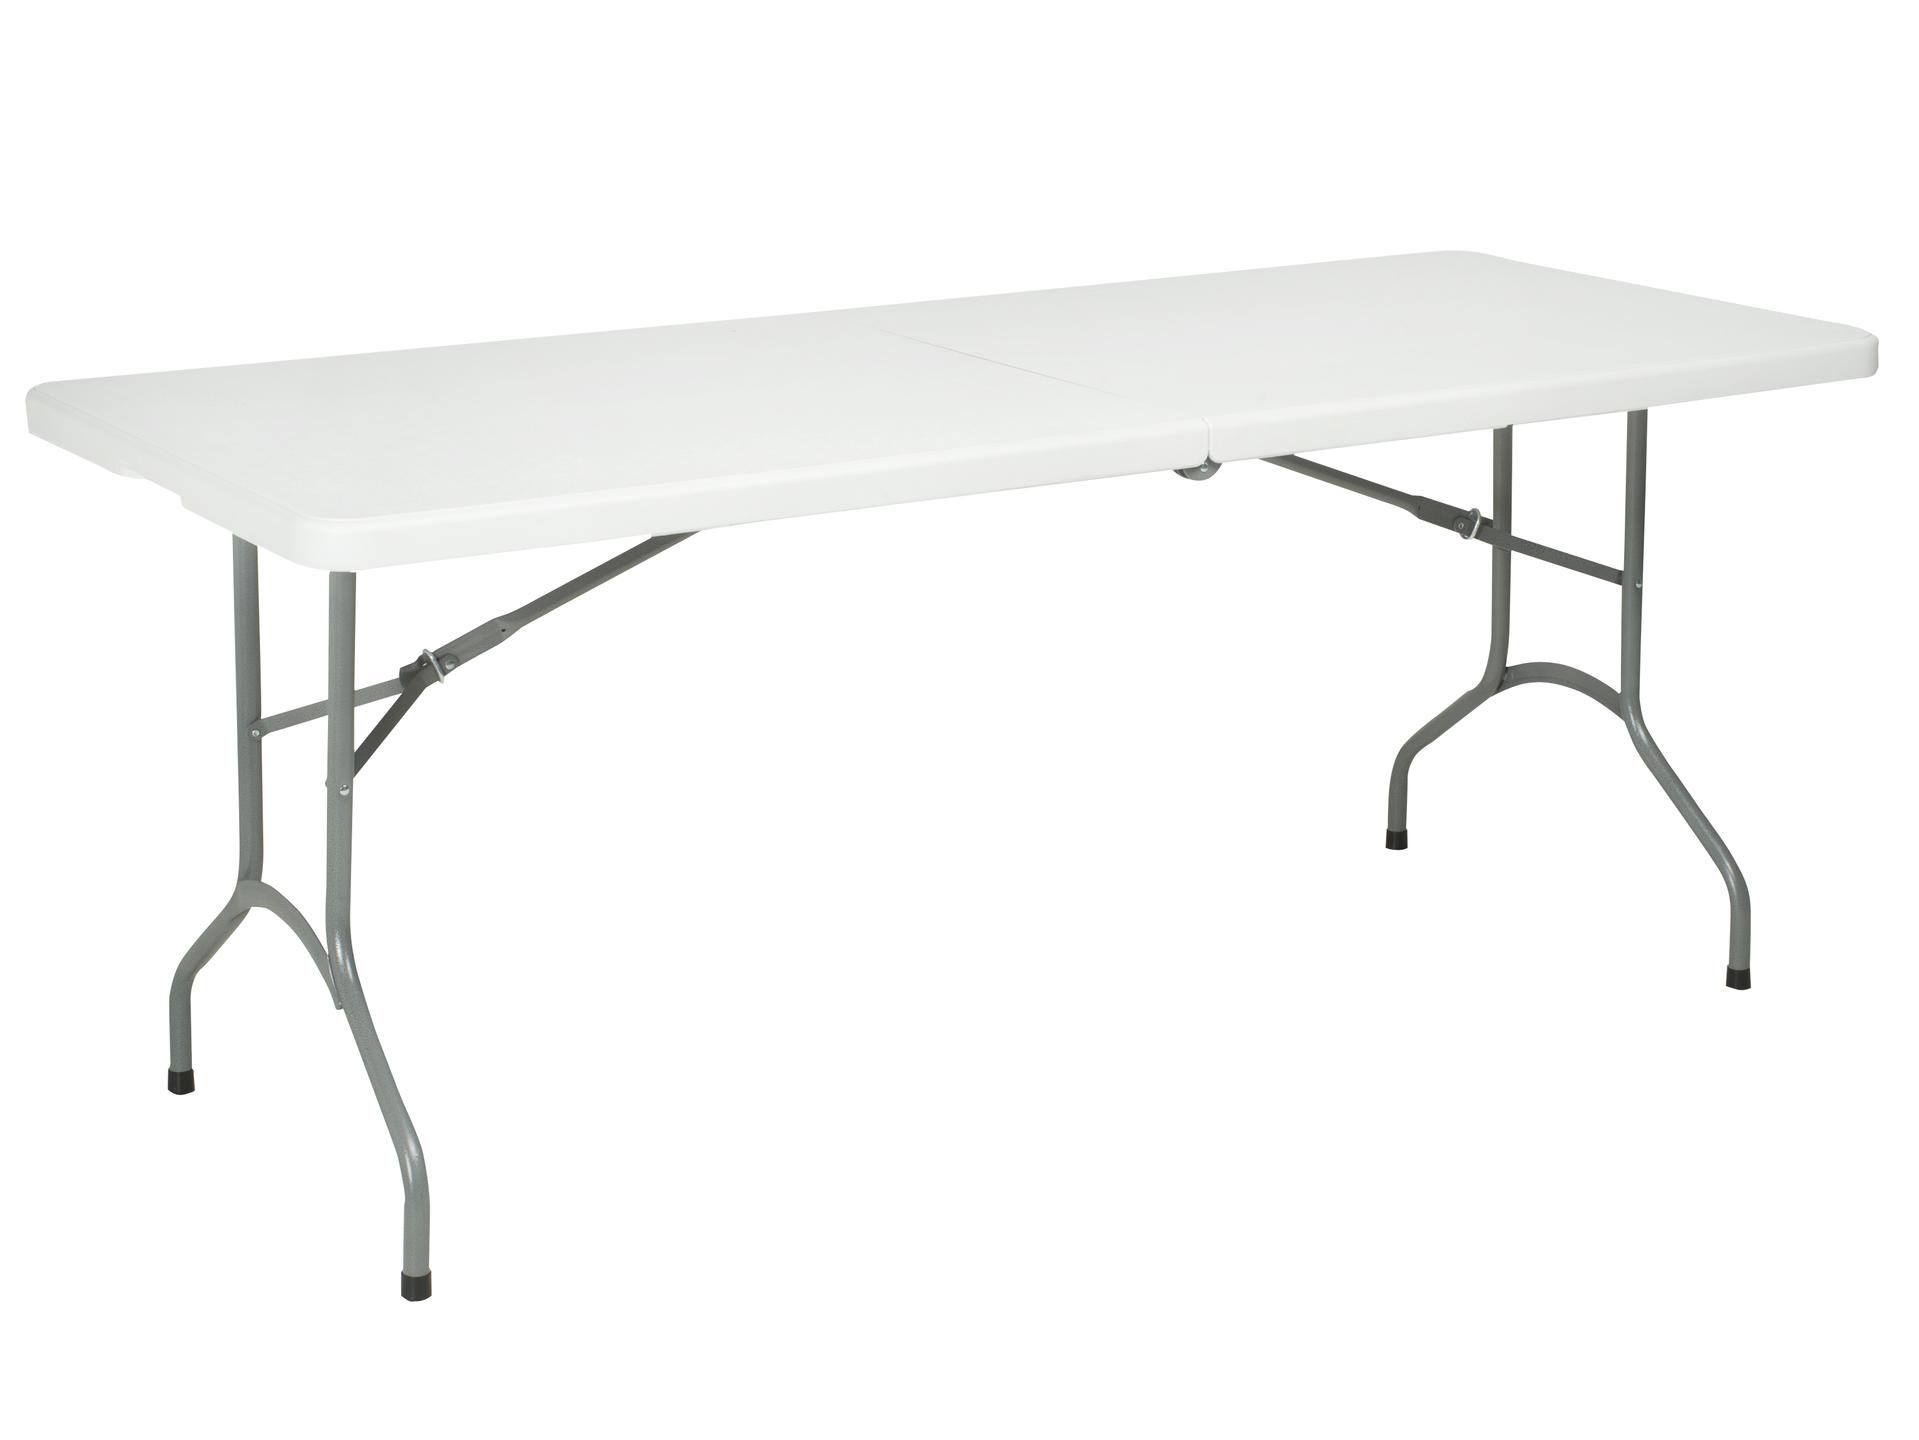 Table pliante 180x74 cm blanc